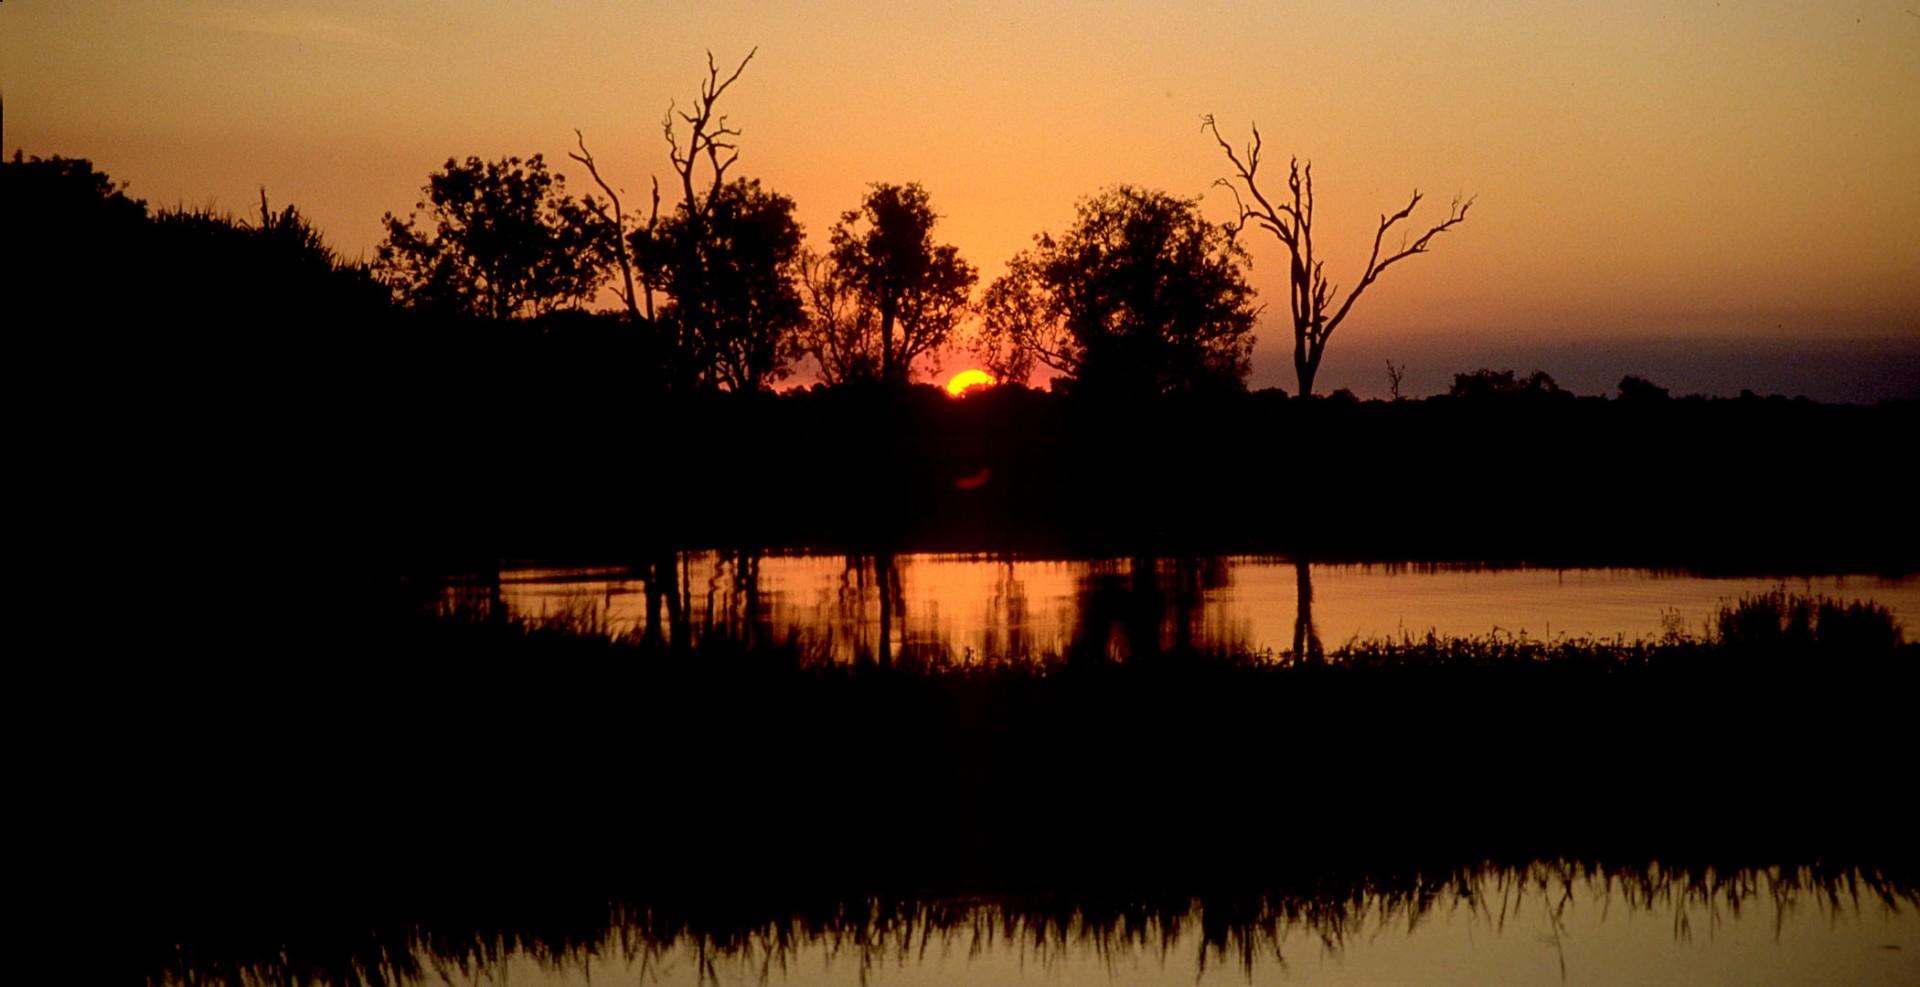 Reportage-Fotograf-in-Paris-Reportage-Fotografie-Sonnenuntergang-Kakadu-Nationalpark